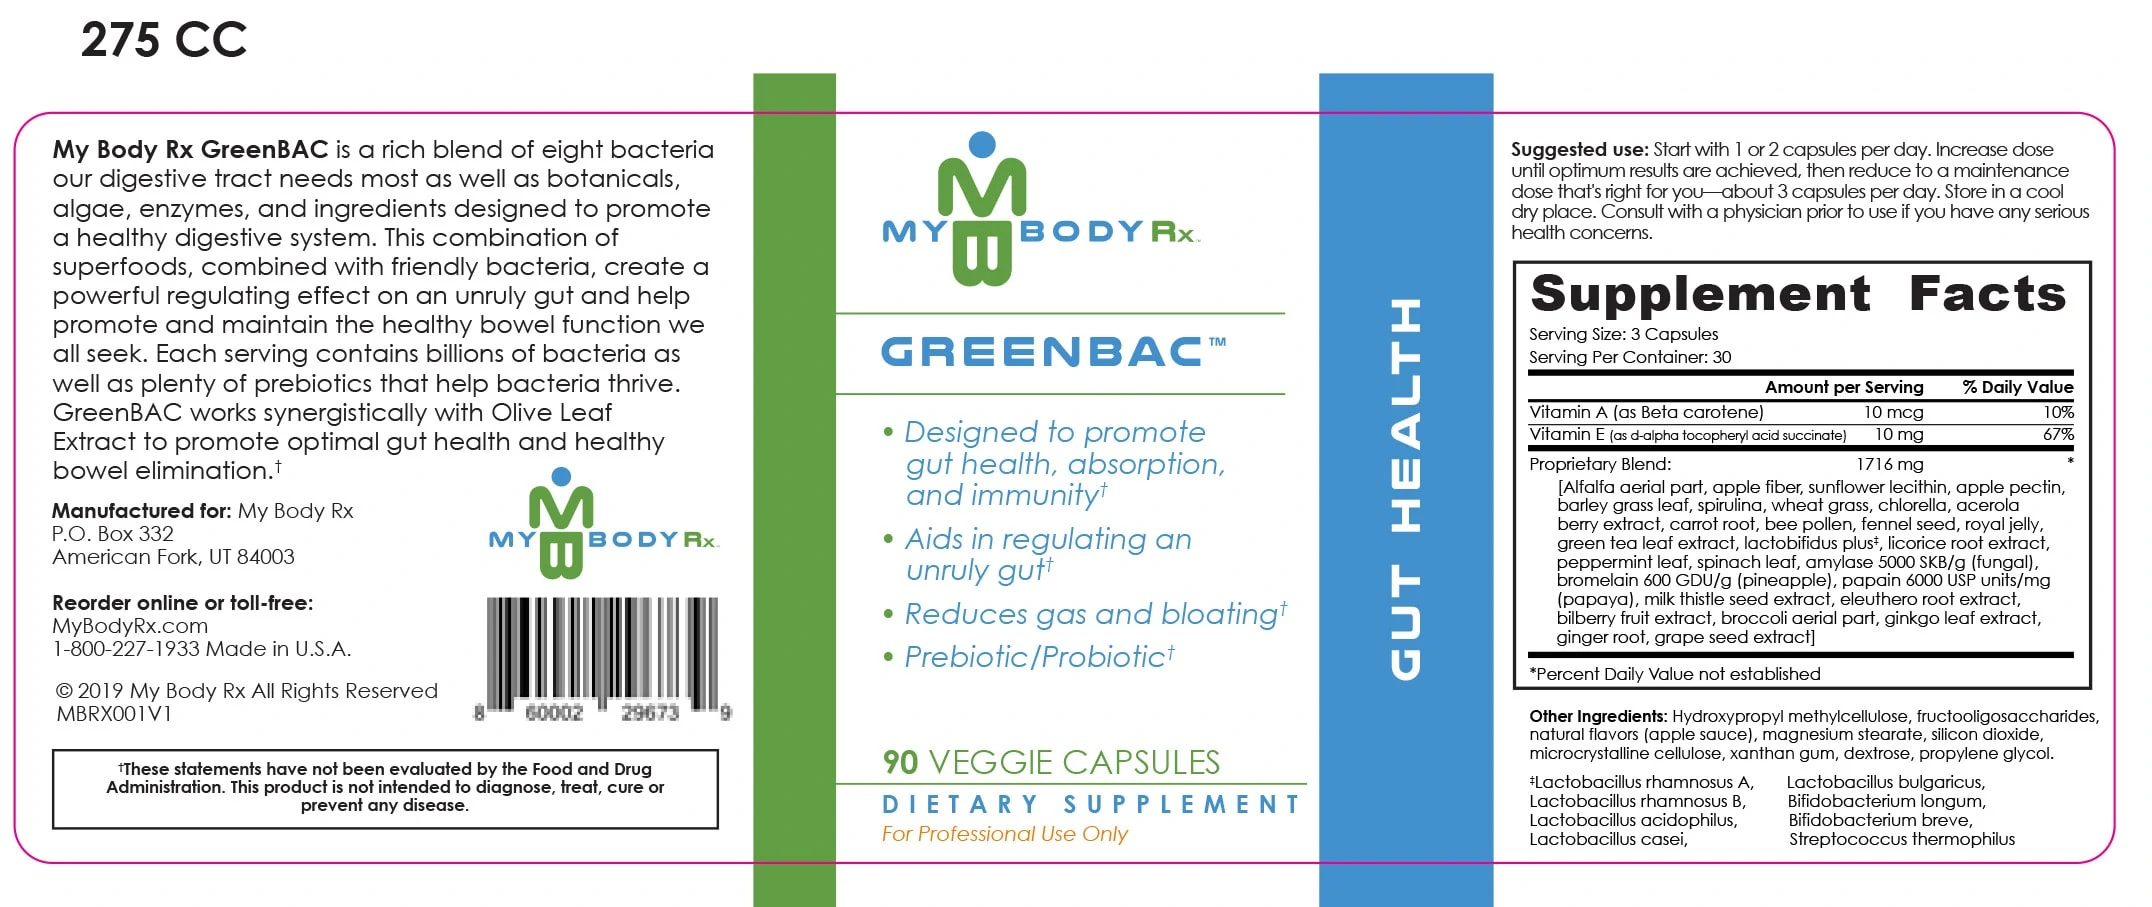 GreenBAC – Gut Health Supplement Ingredients